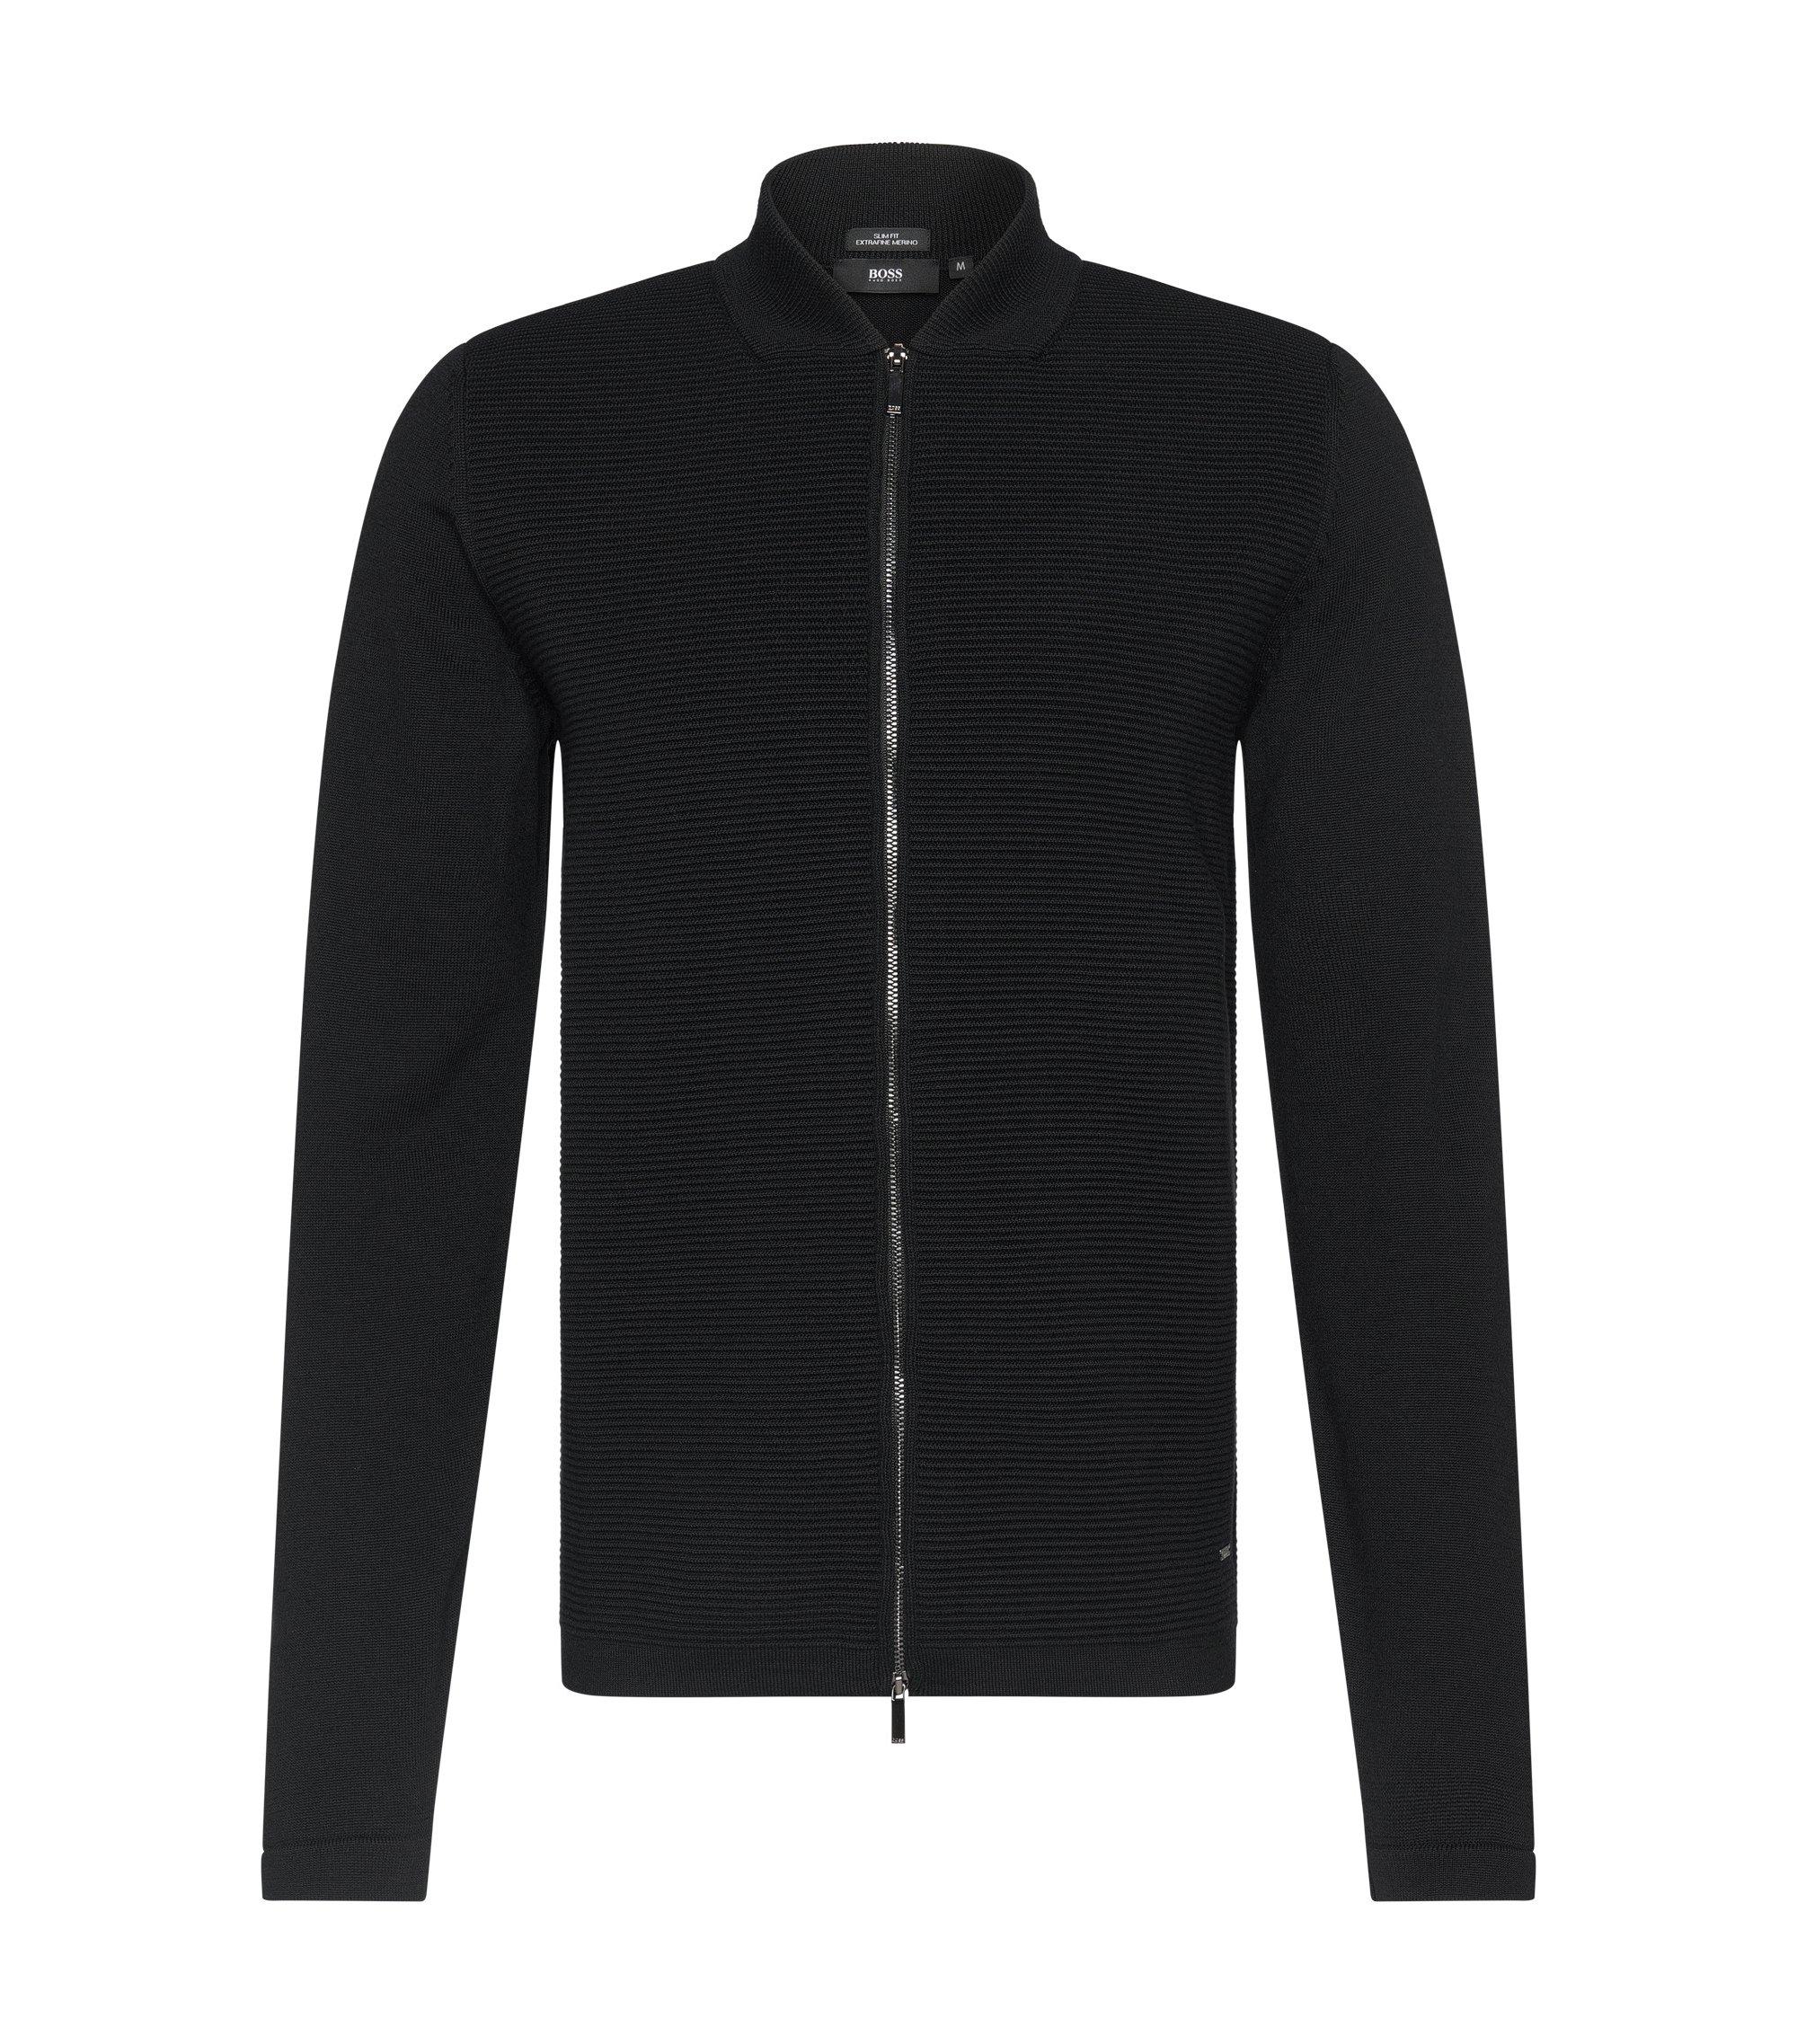 Virgin Wool Ottoman Zip Sweater Jacket | Inat, Black